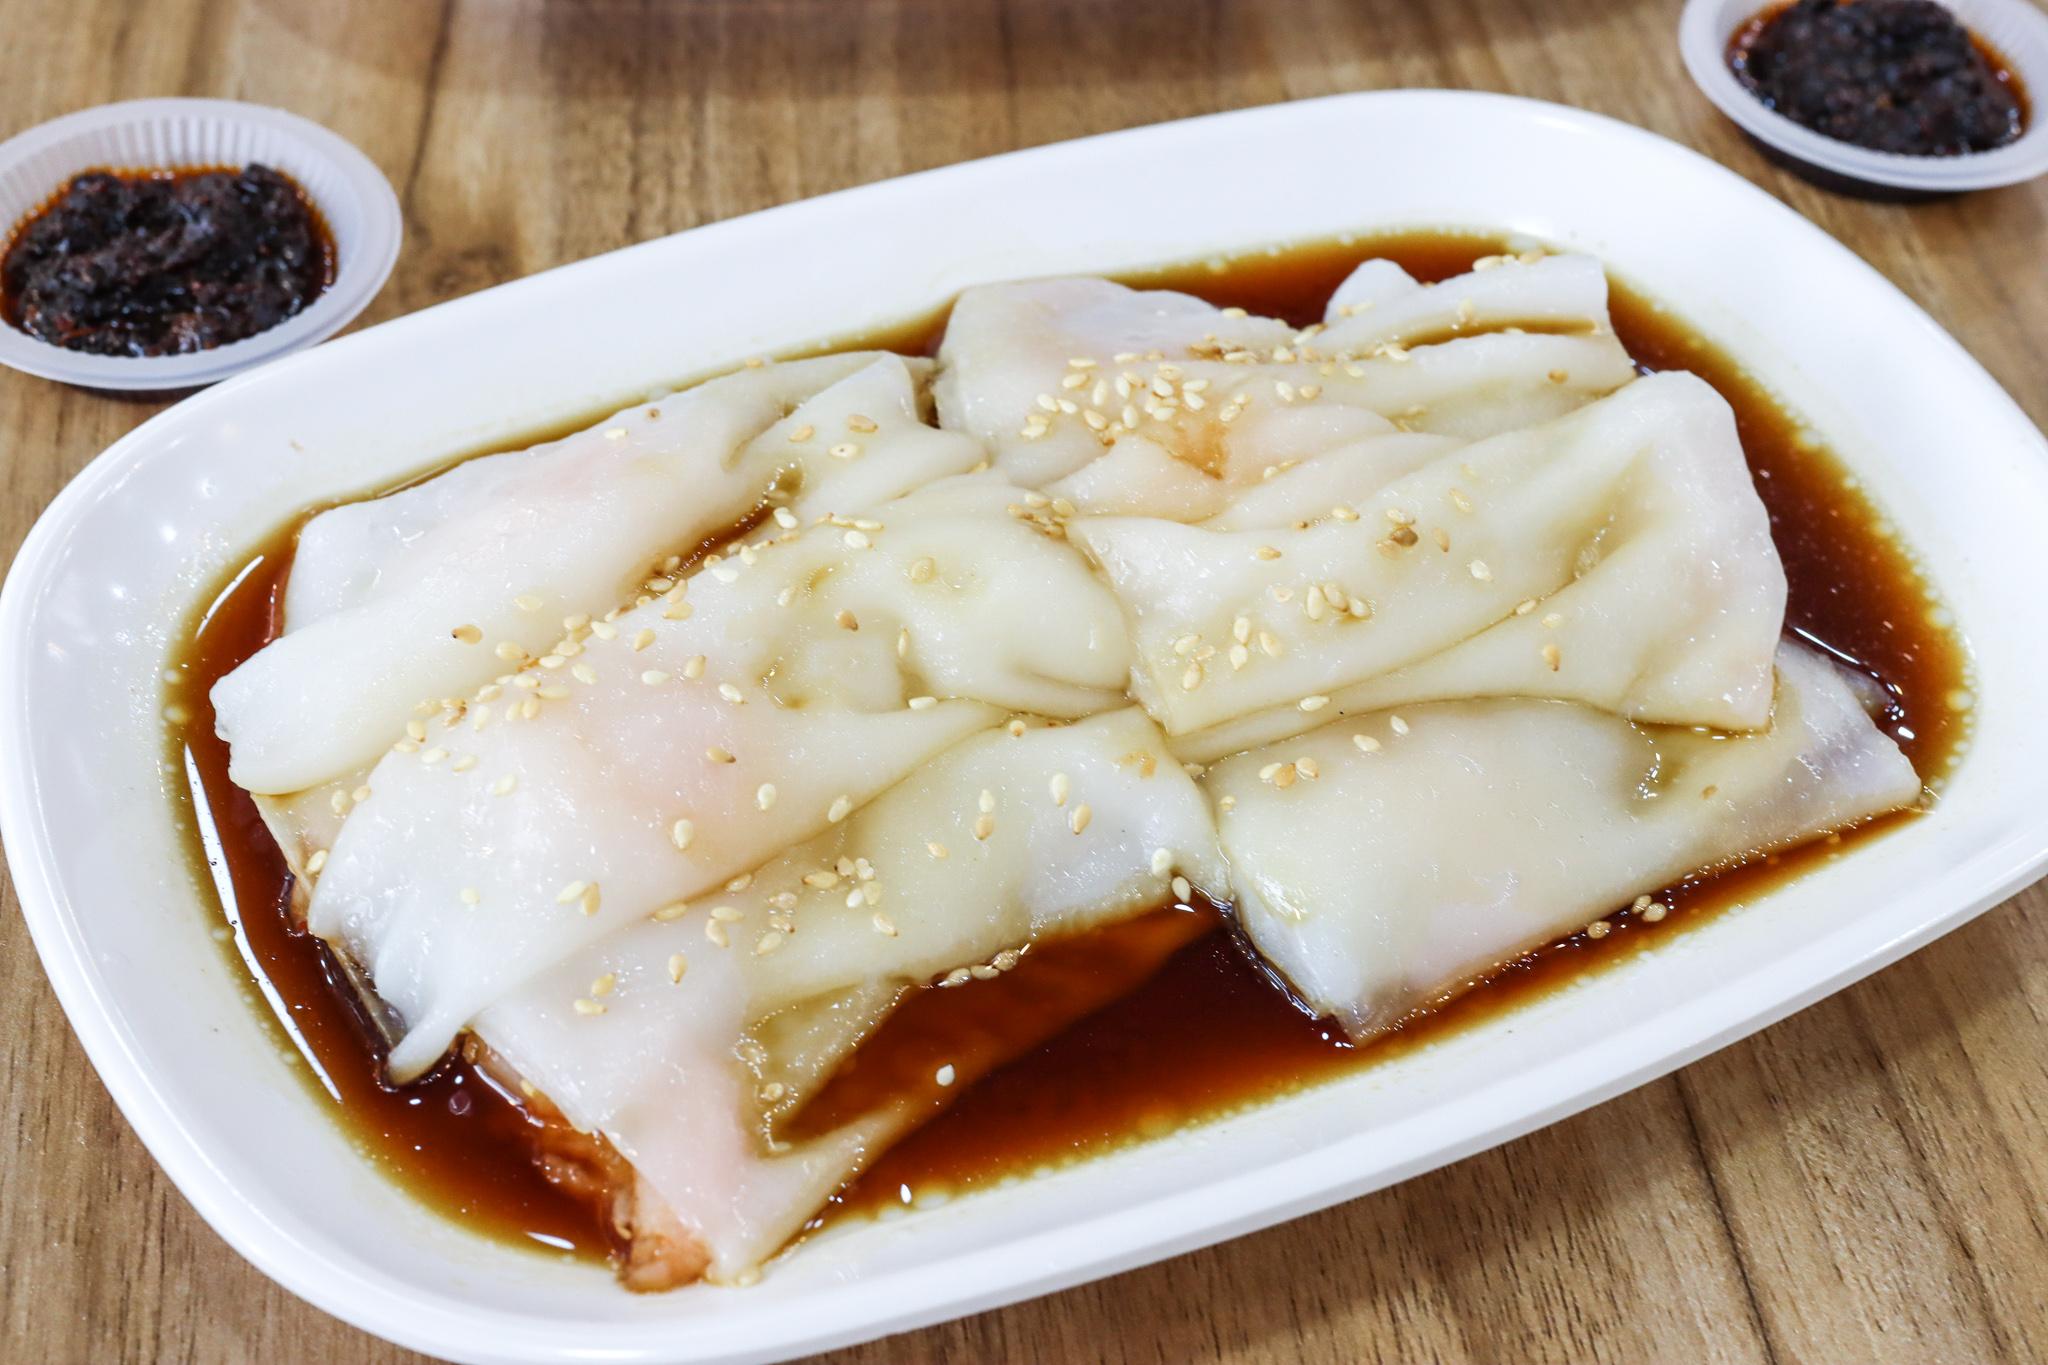 chefweihkcheecheongfun-04